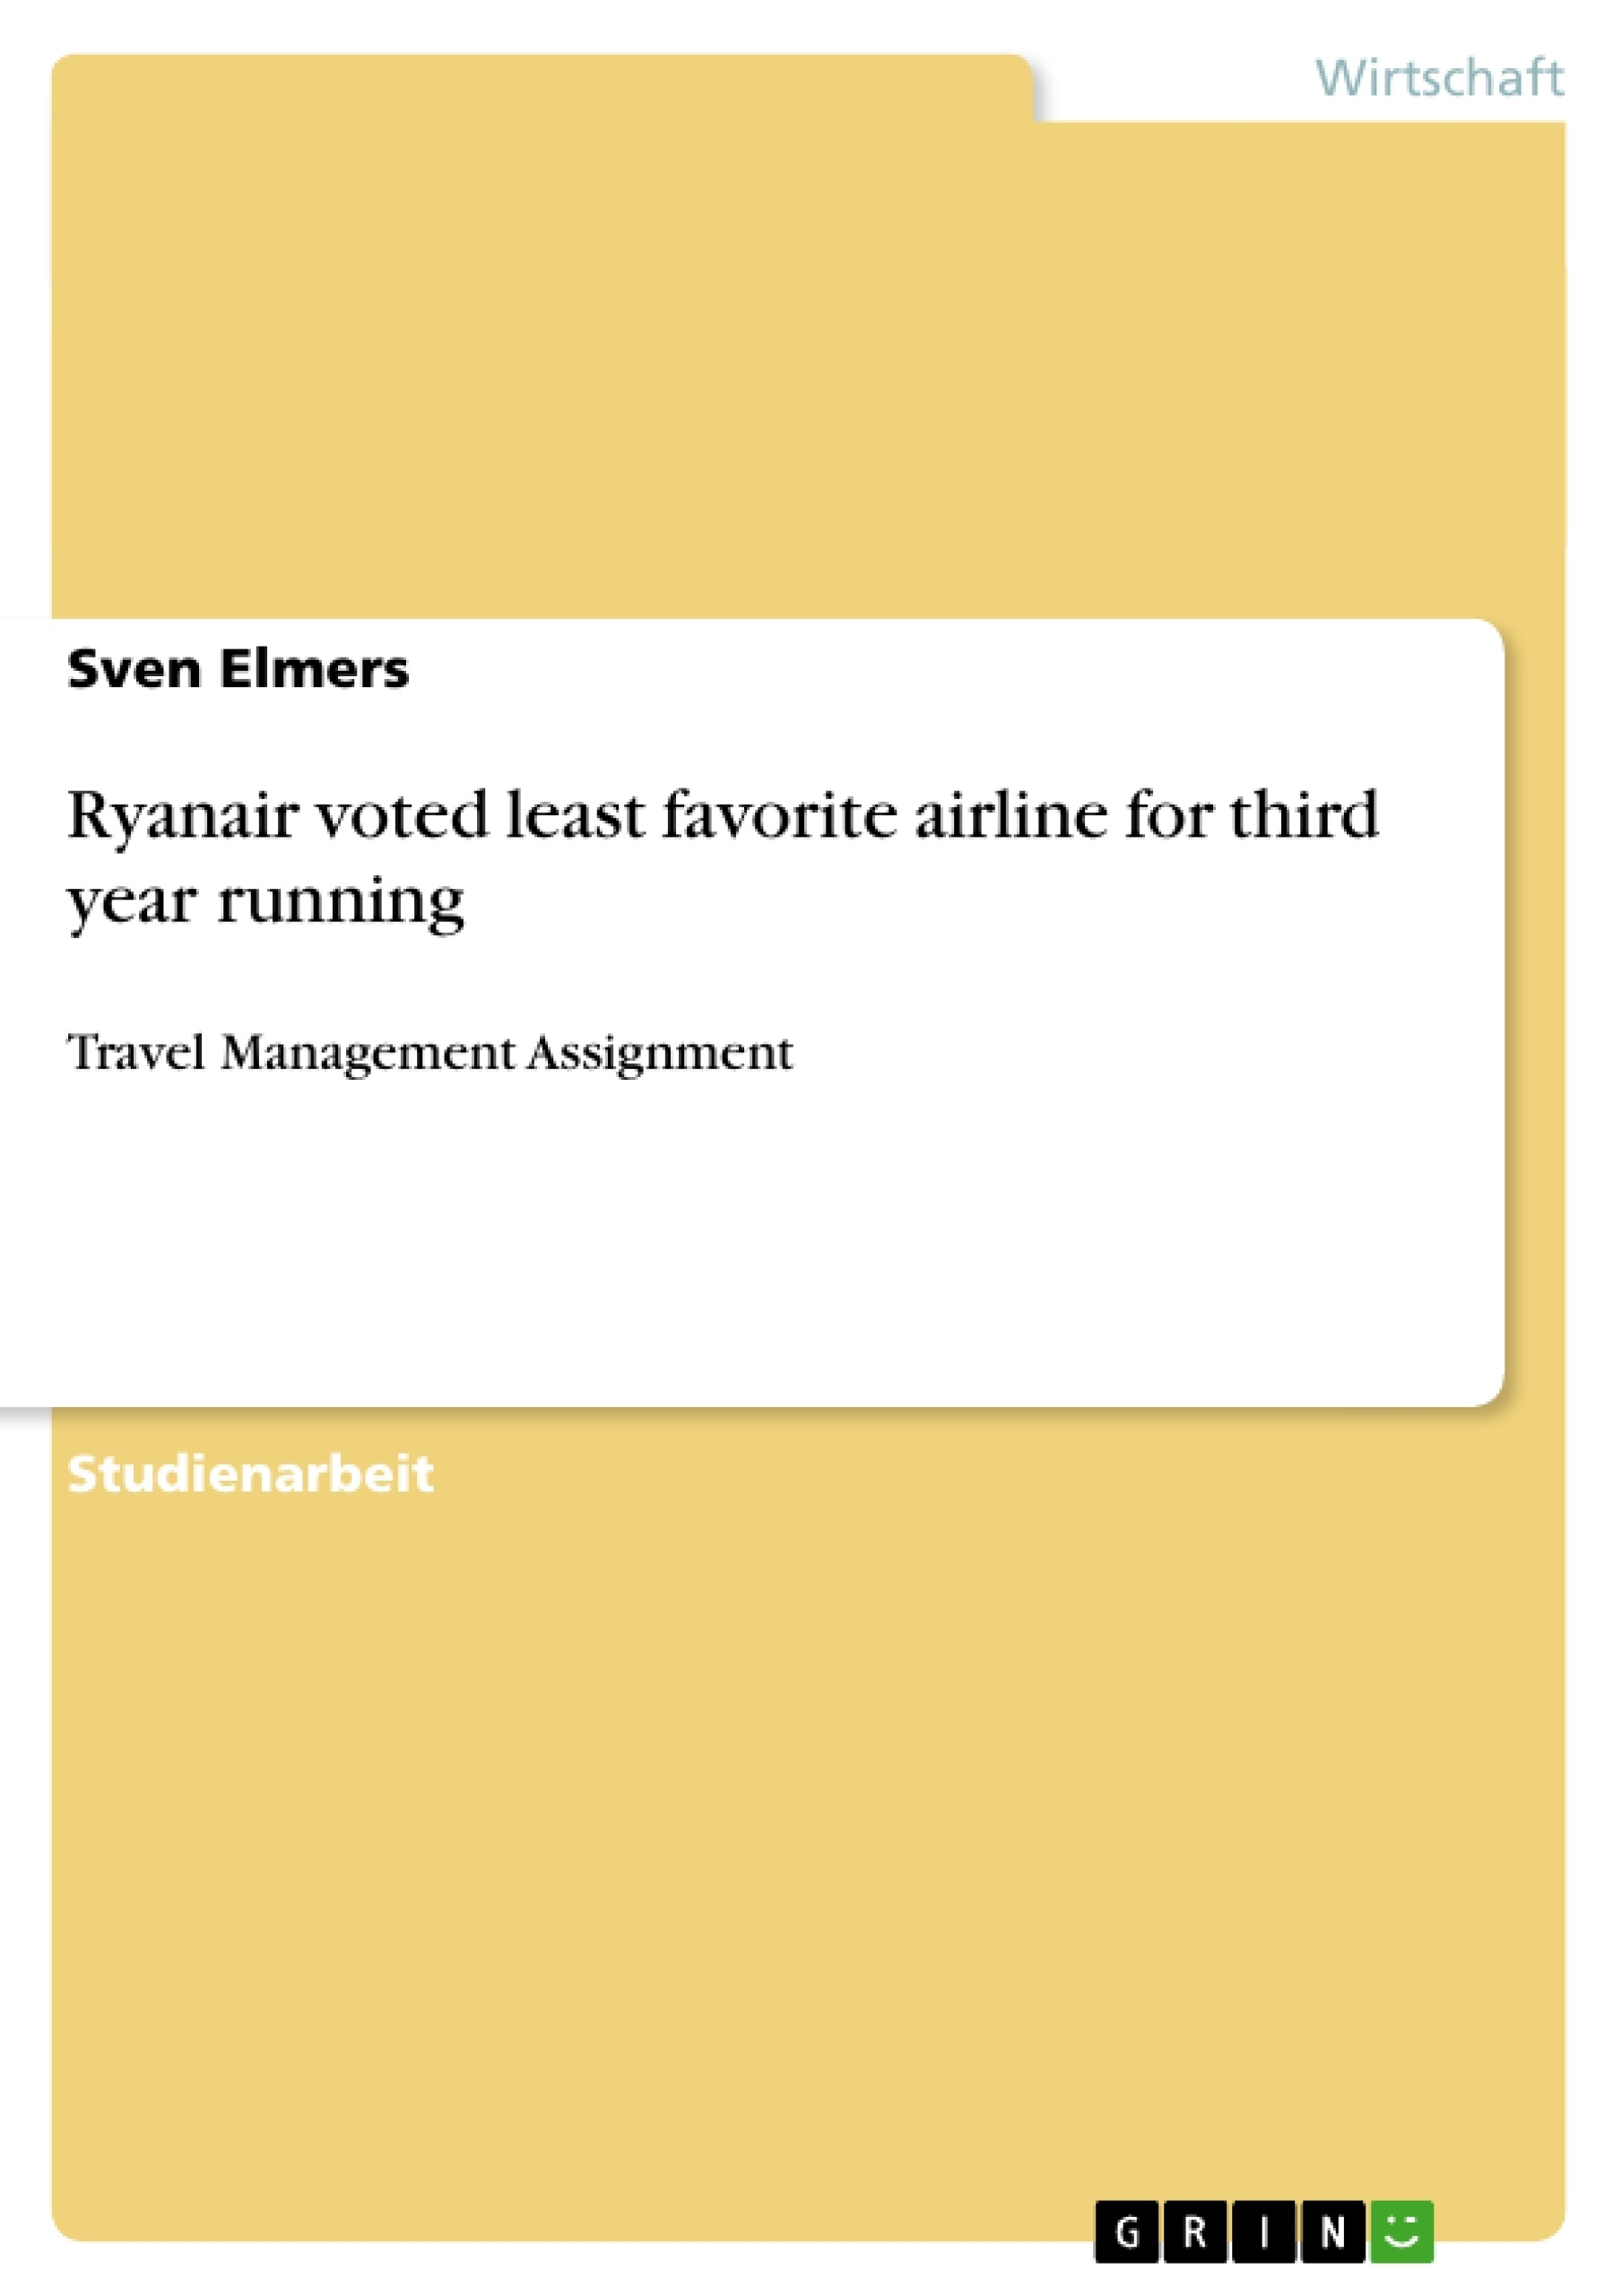 Titel: Ryanair voted least favorite airline for third year running